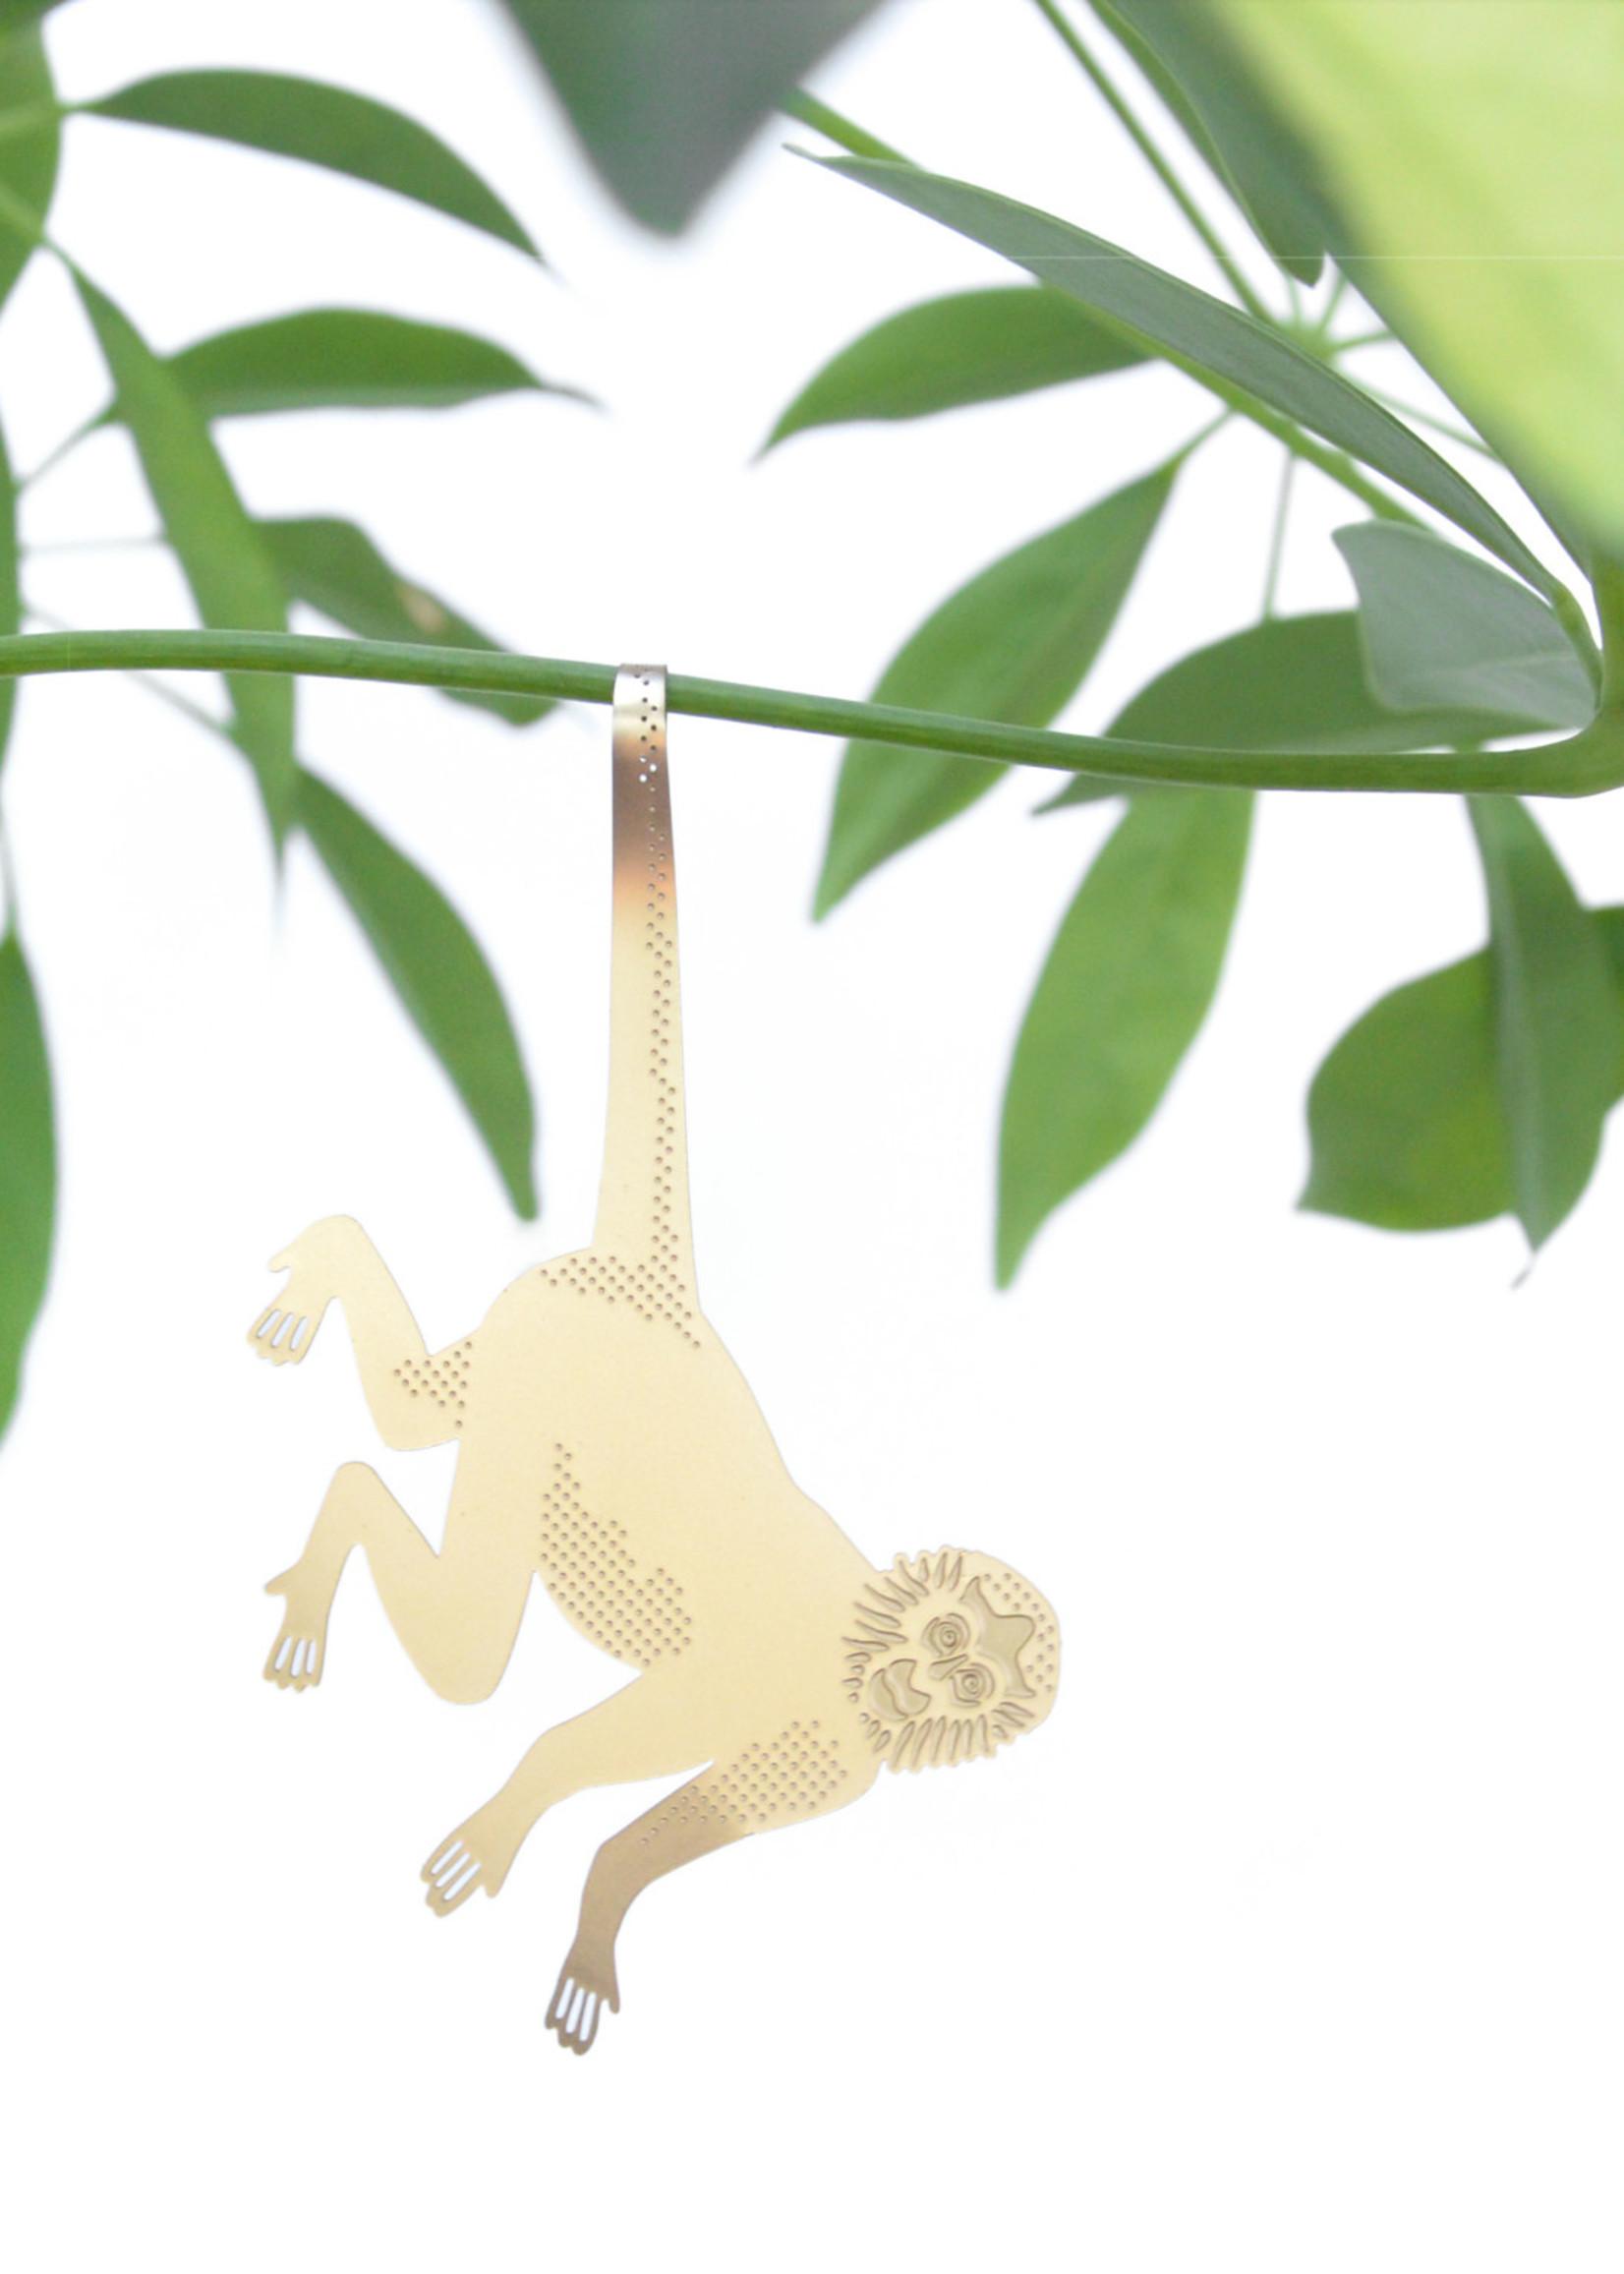 A.S Plant Animal SLINGER AAP spider monkey